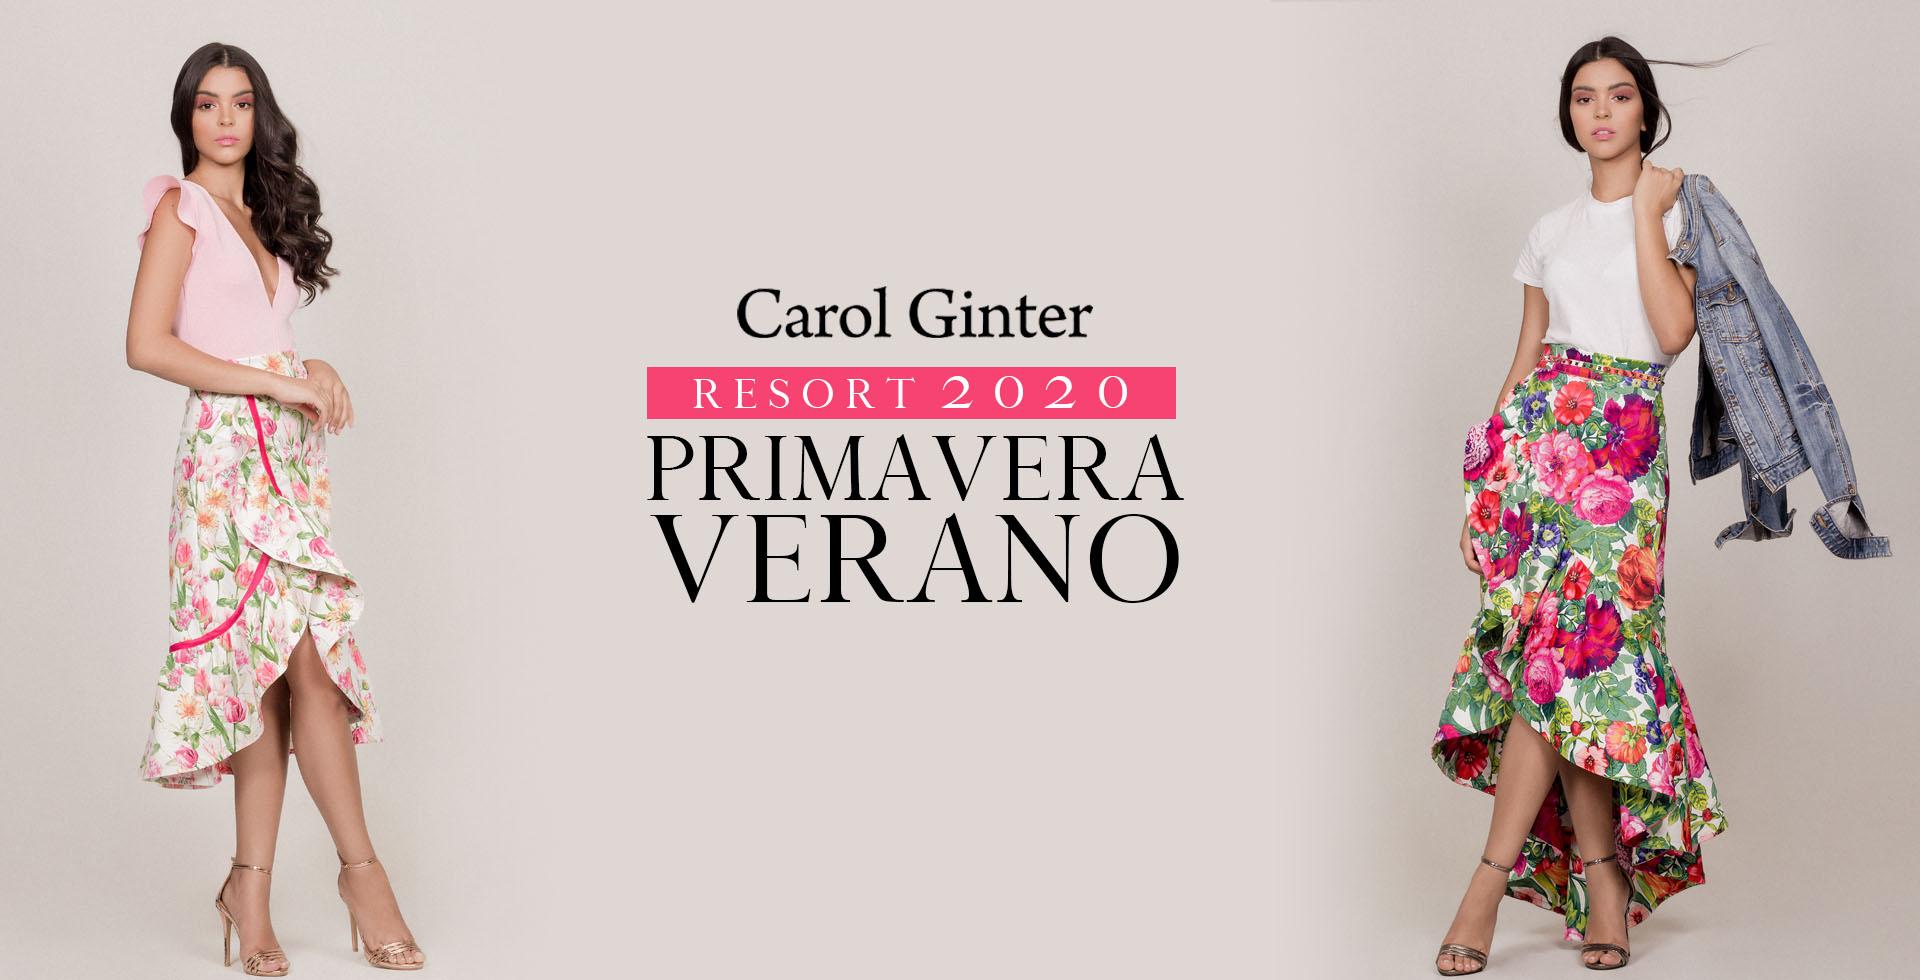 Carol Ginter - Resort 2020 Primavera Verano